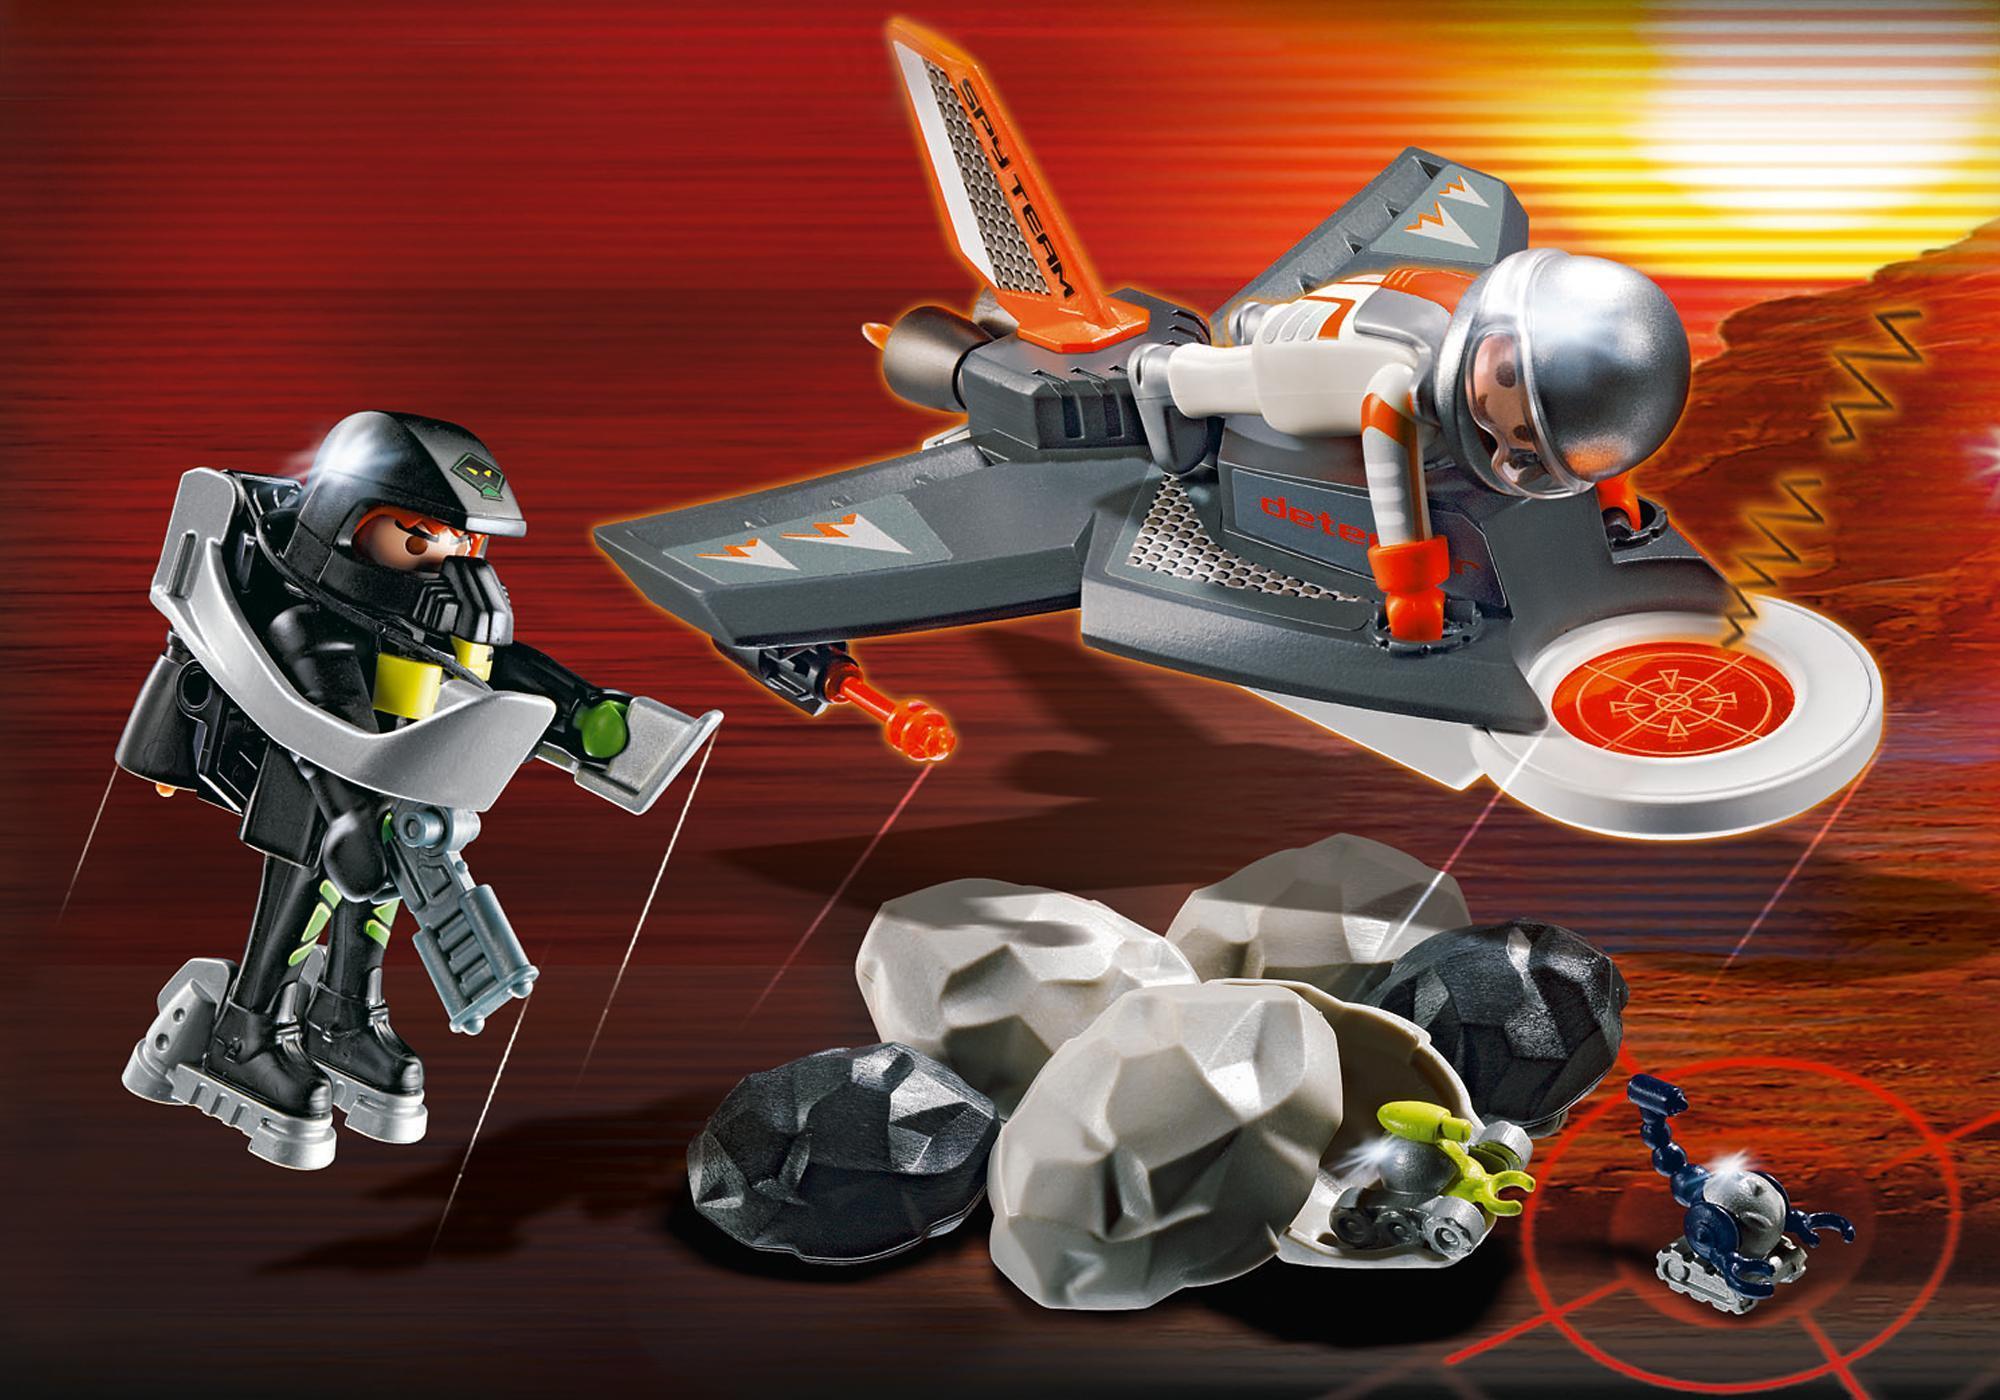 http://media.playmobil.com/i/playmobil/4877_product_detail/Agenten-Detektorjet